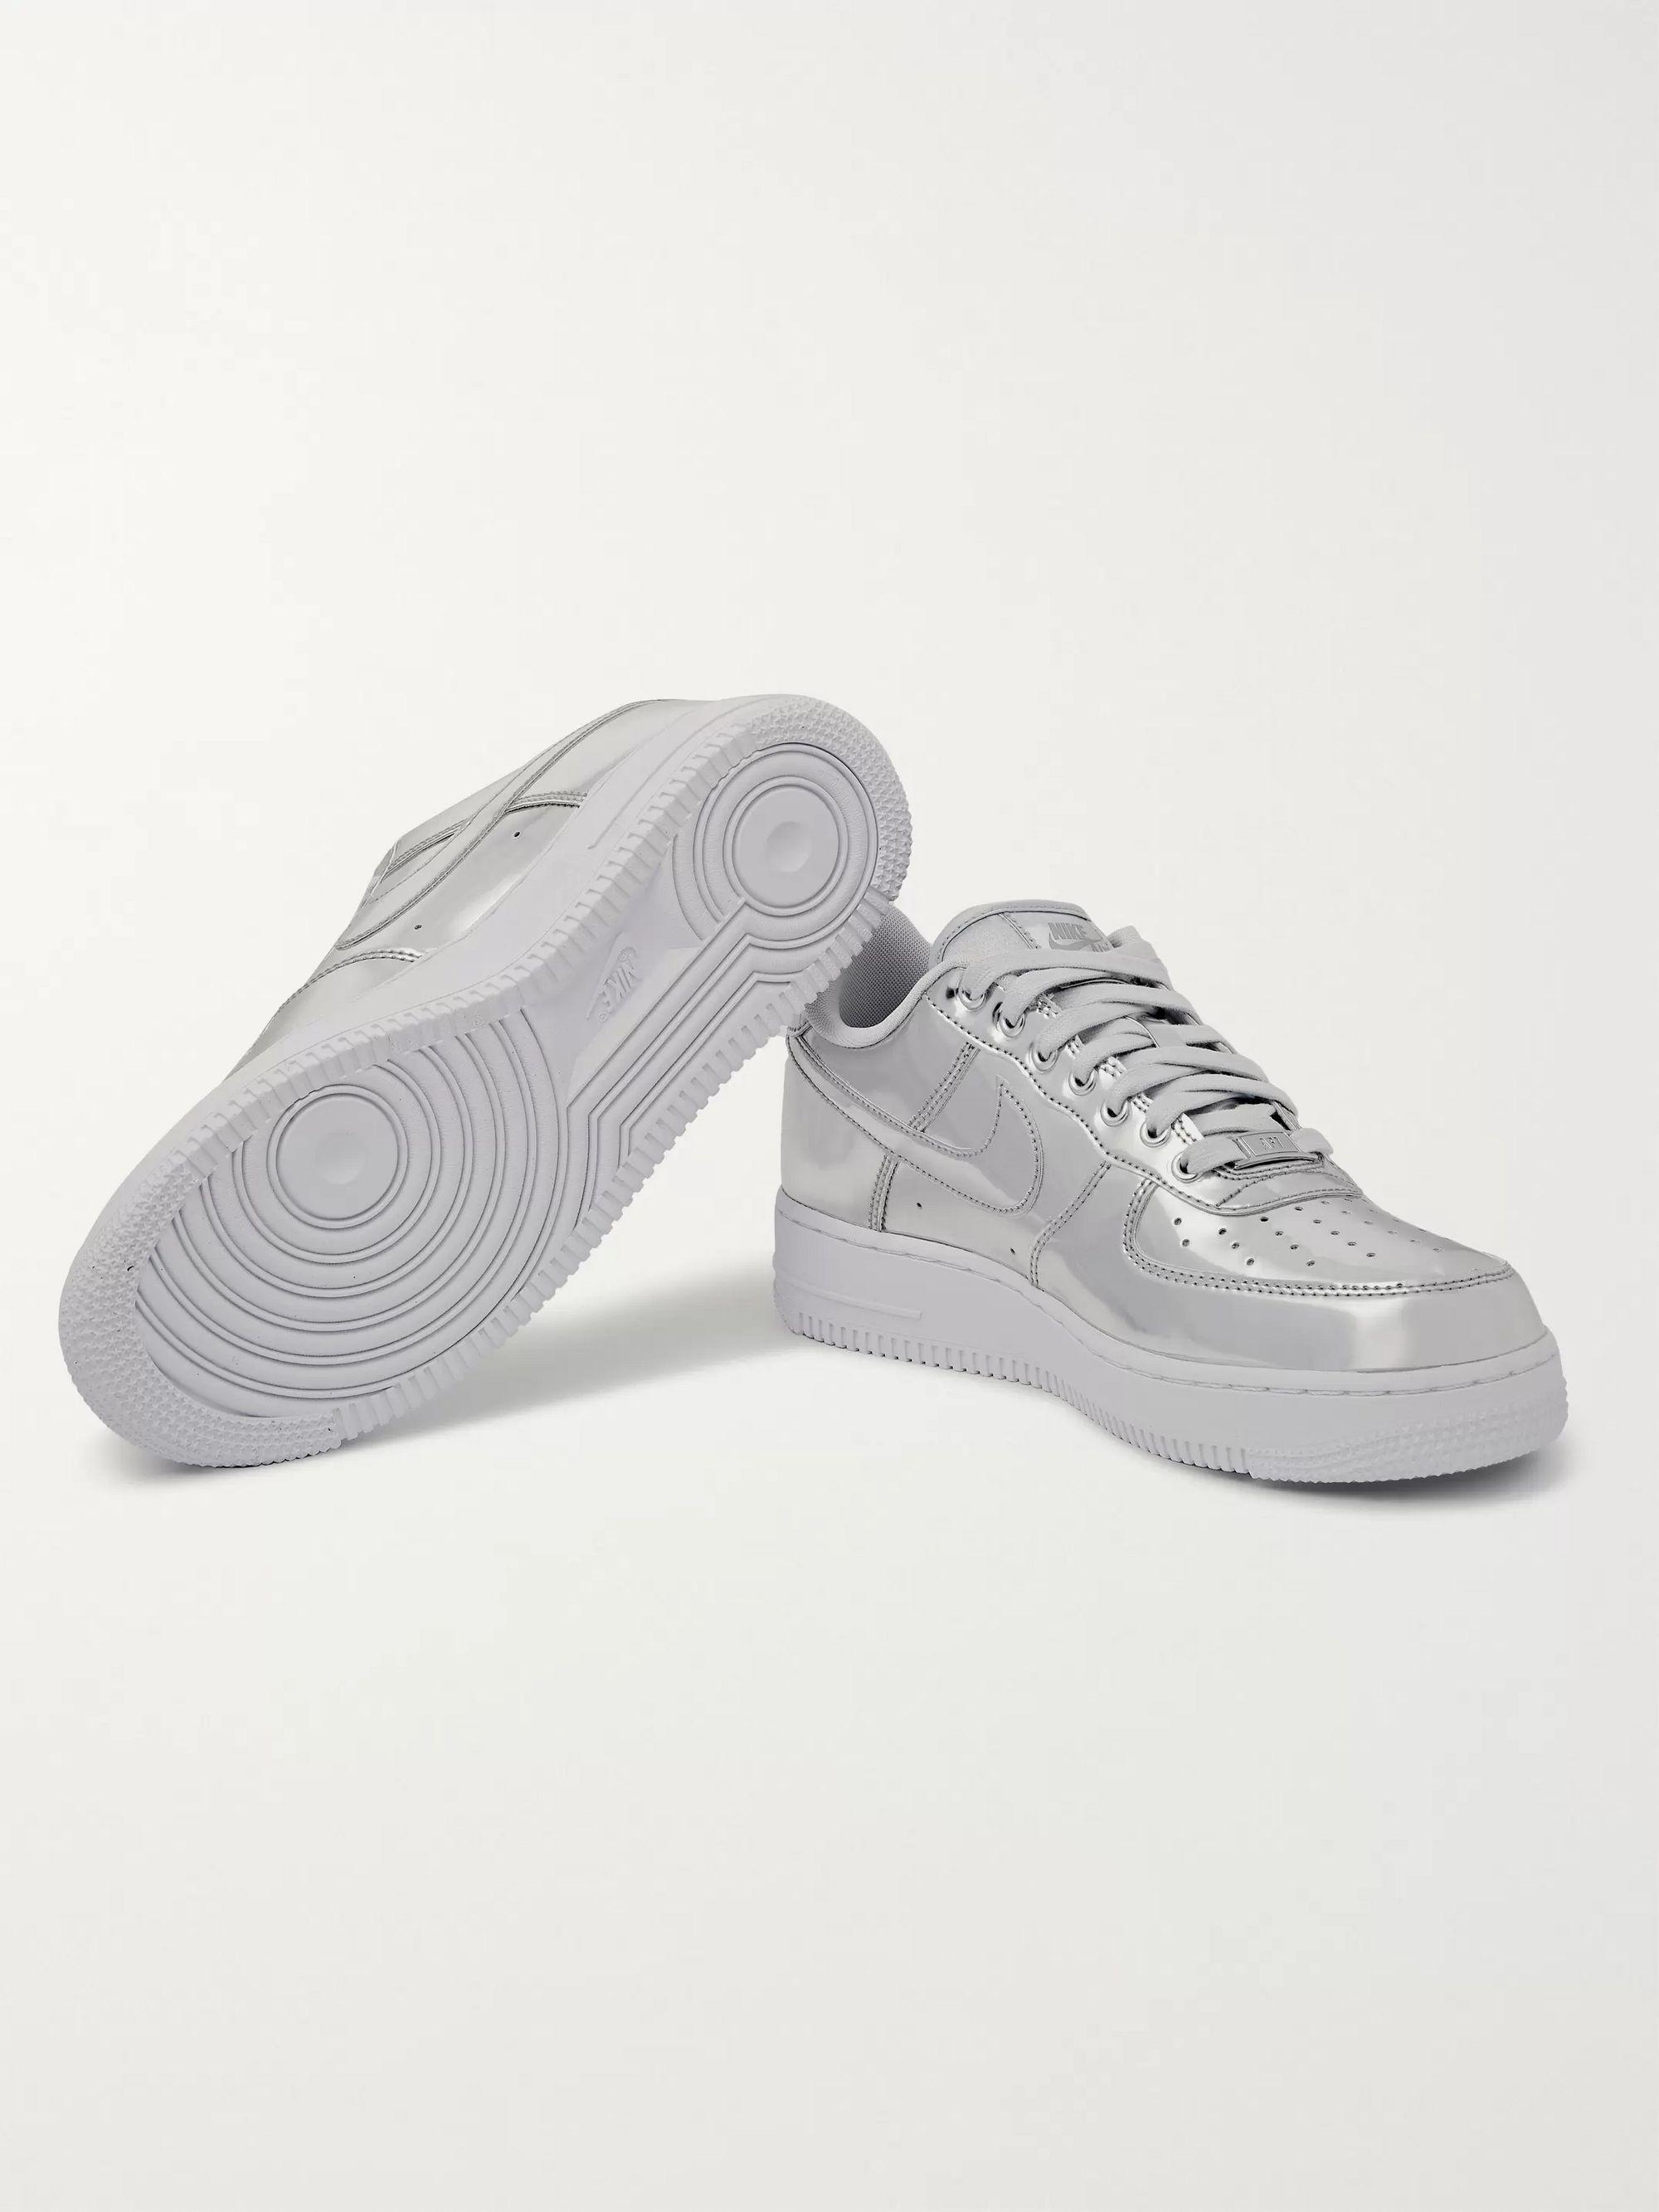 Nike Air Force 1 | Pinterest @ allisonngg | | Sneakers, Nike